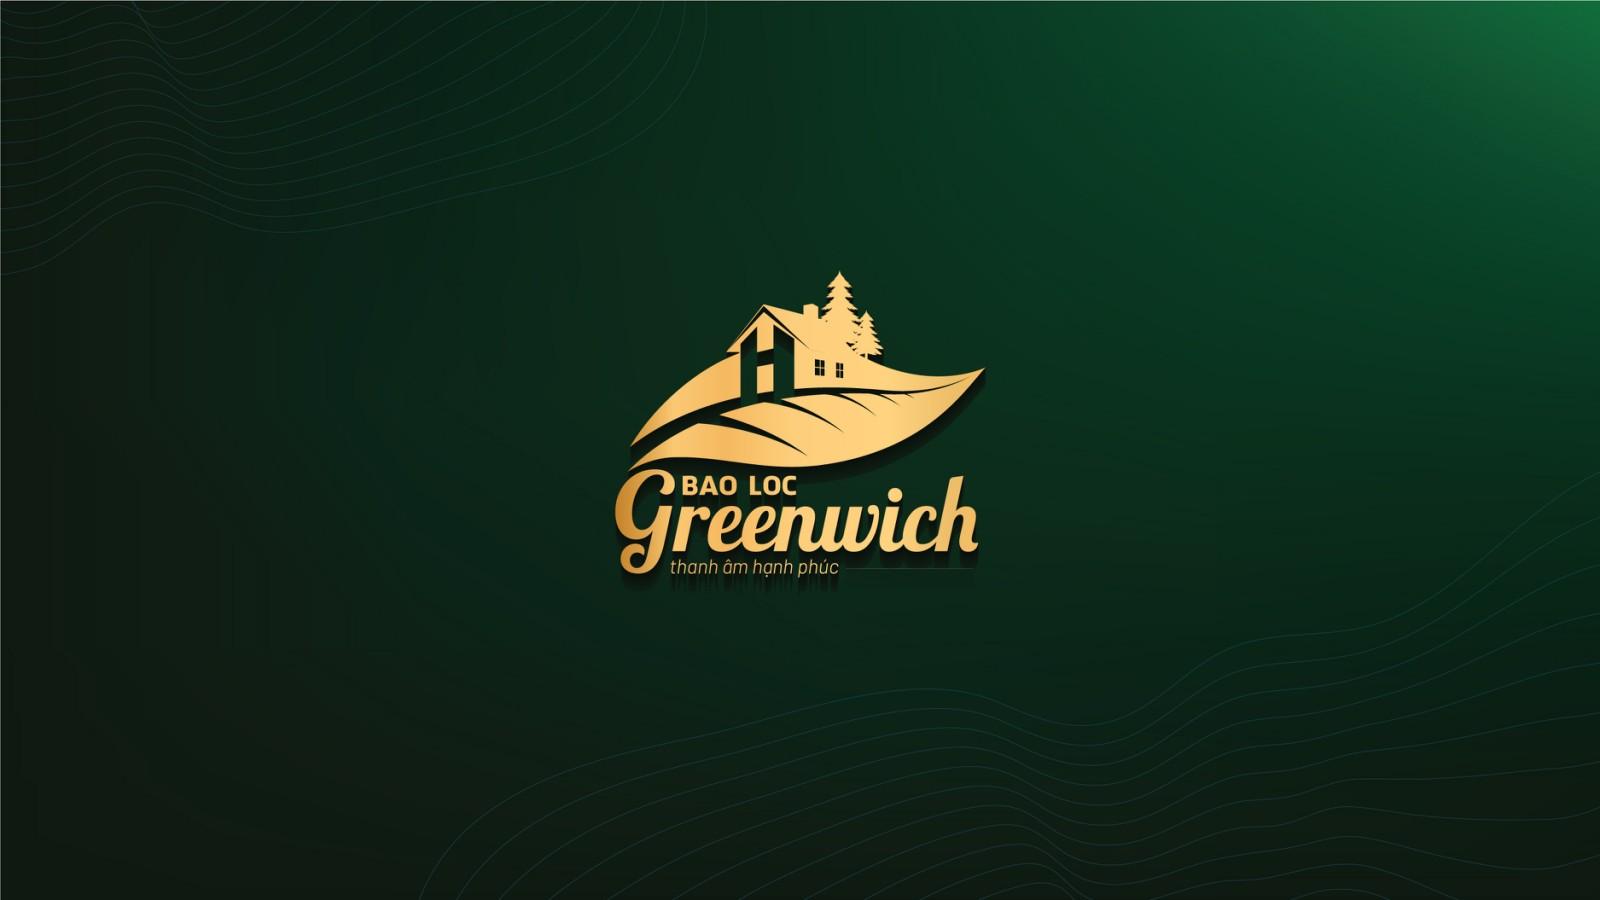 logo-bao-loc-green-wich